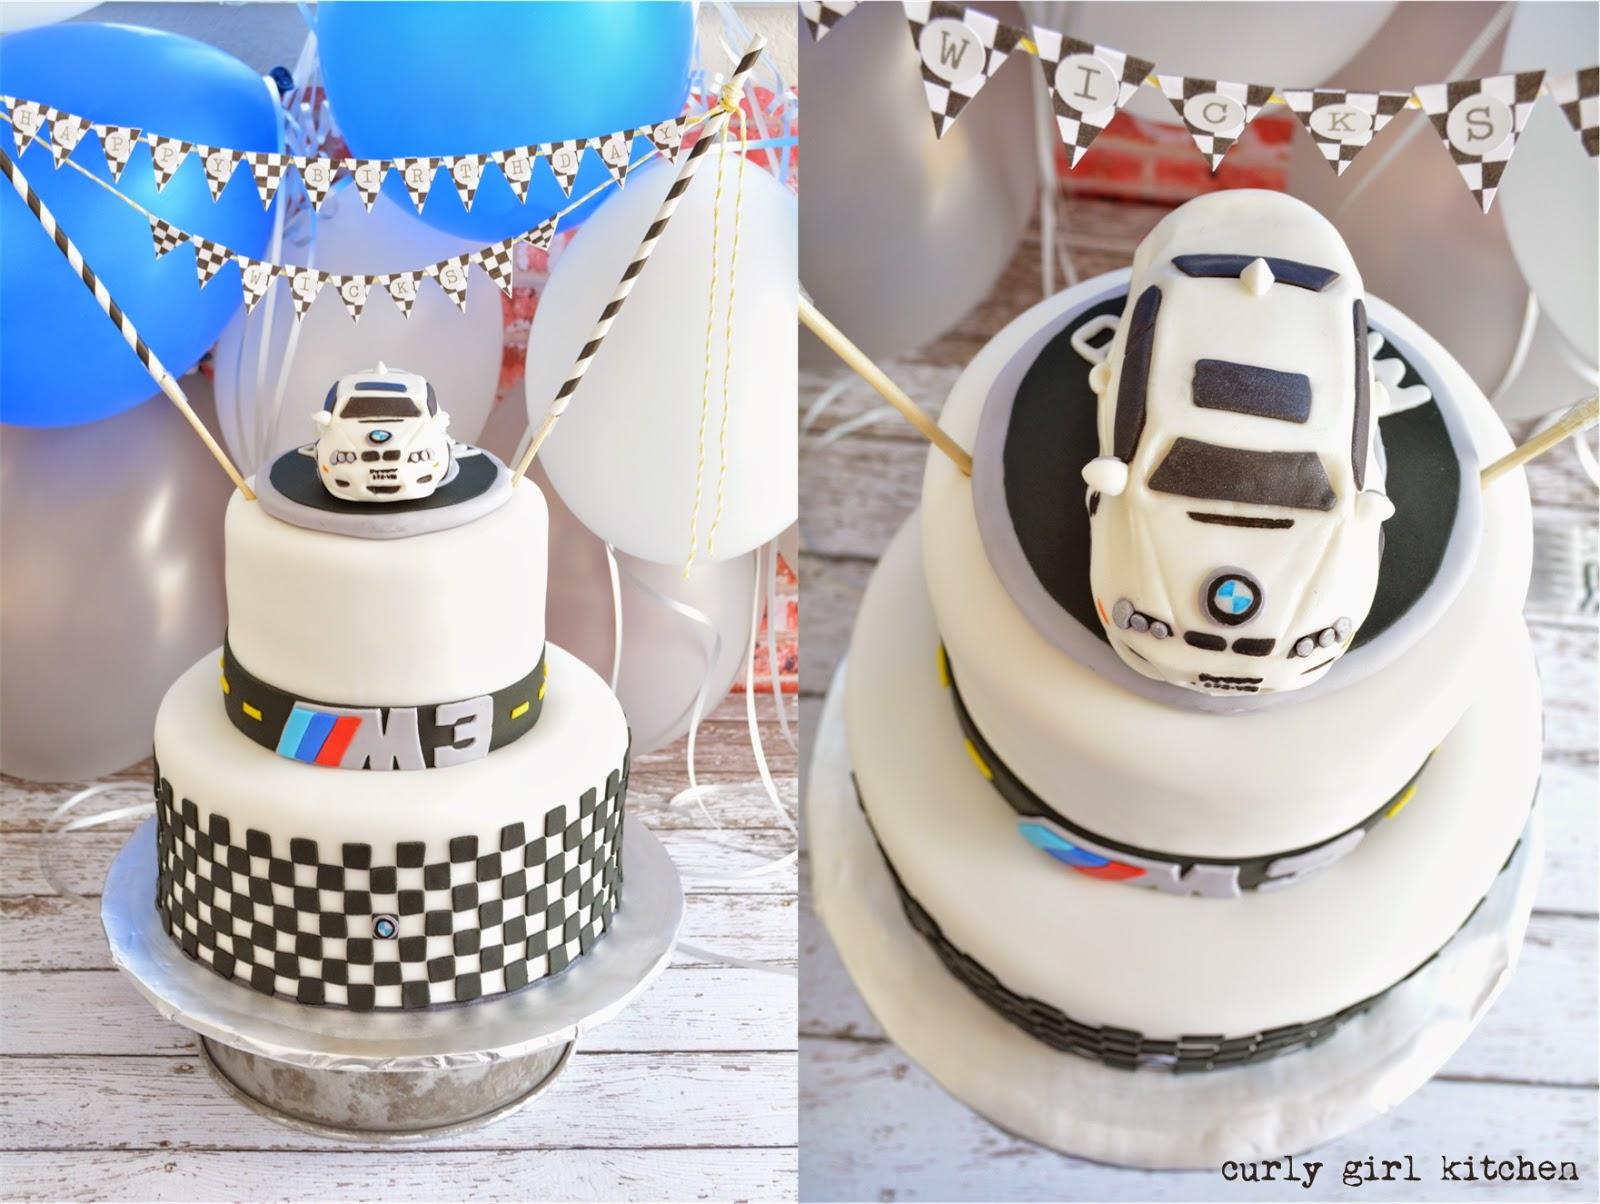 Curly Girl Kitchen BMW 40th Birthday Cake